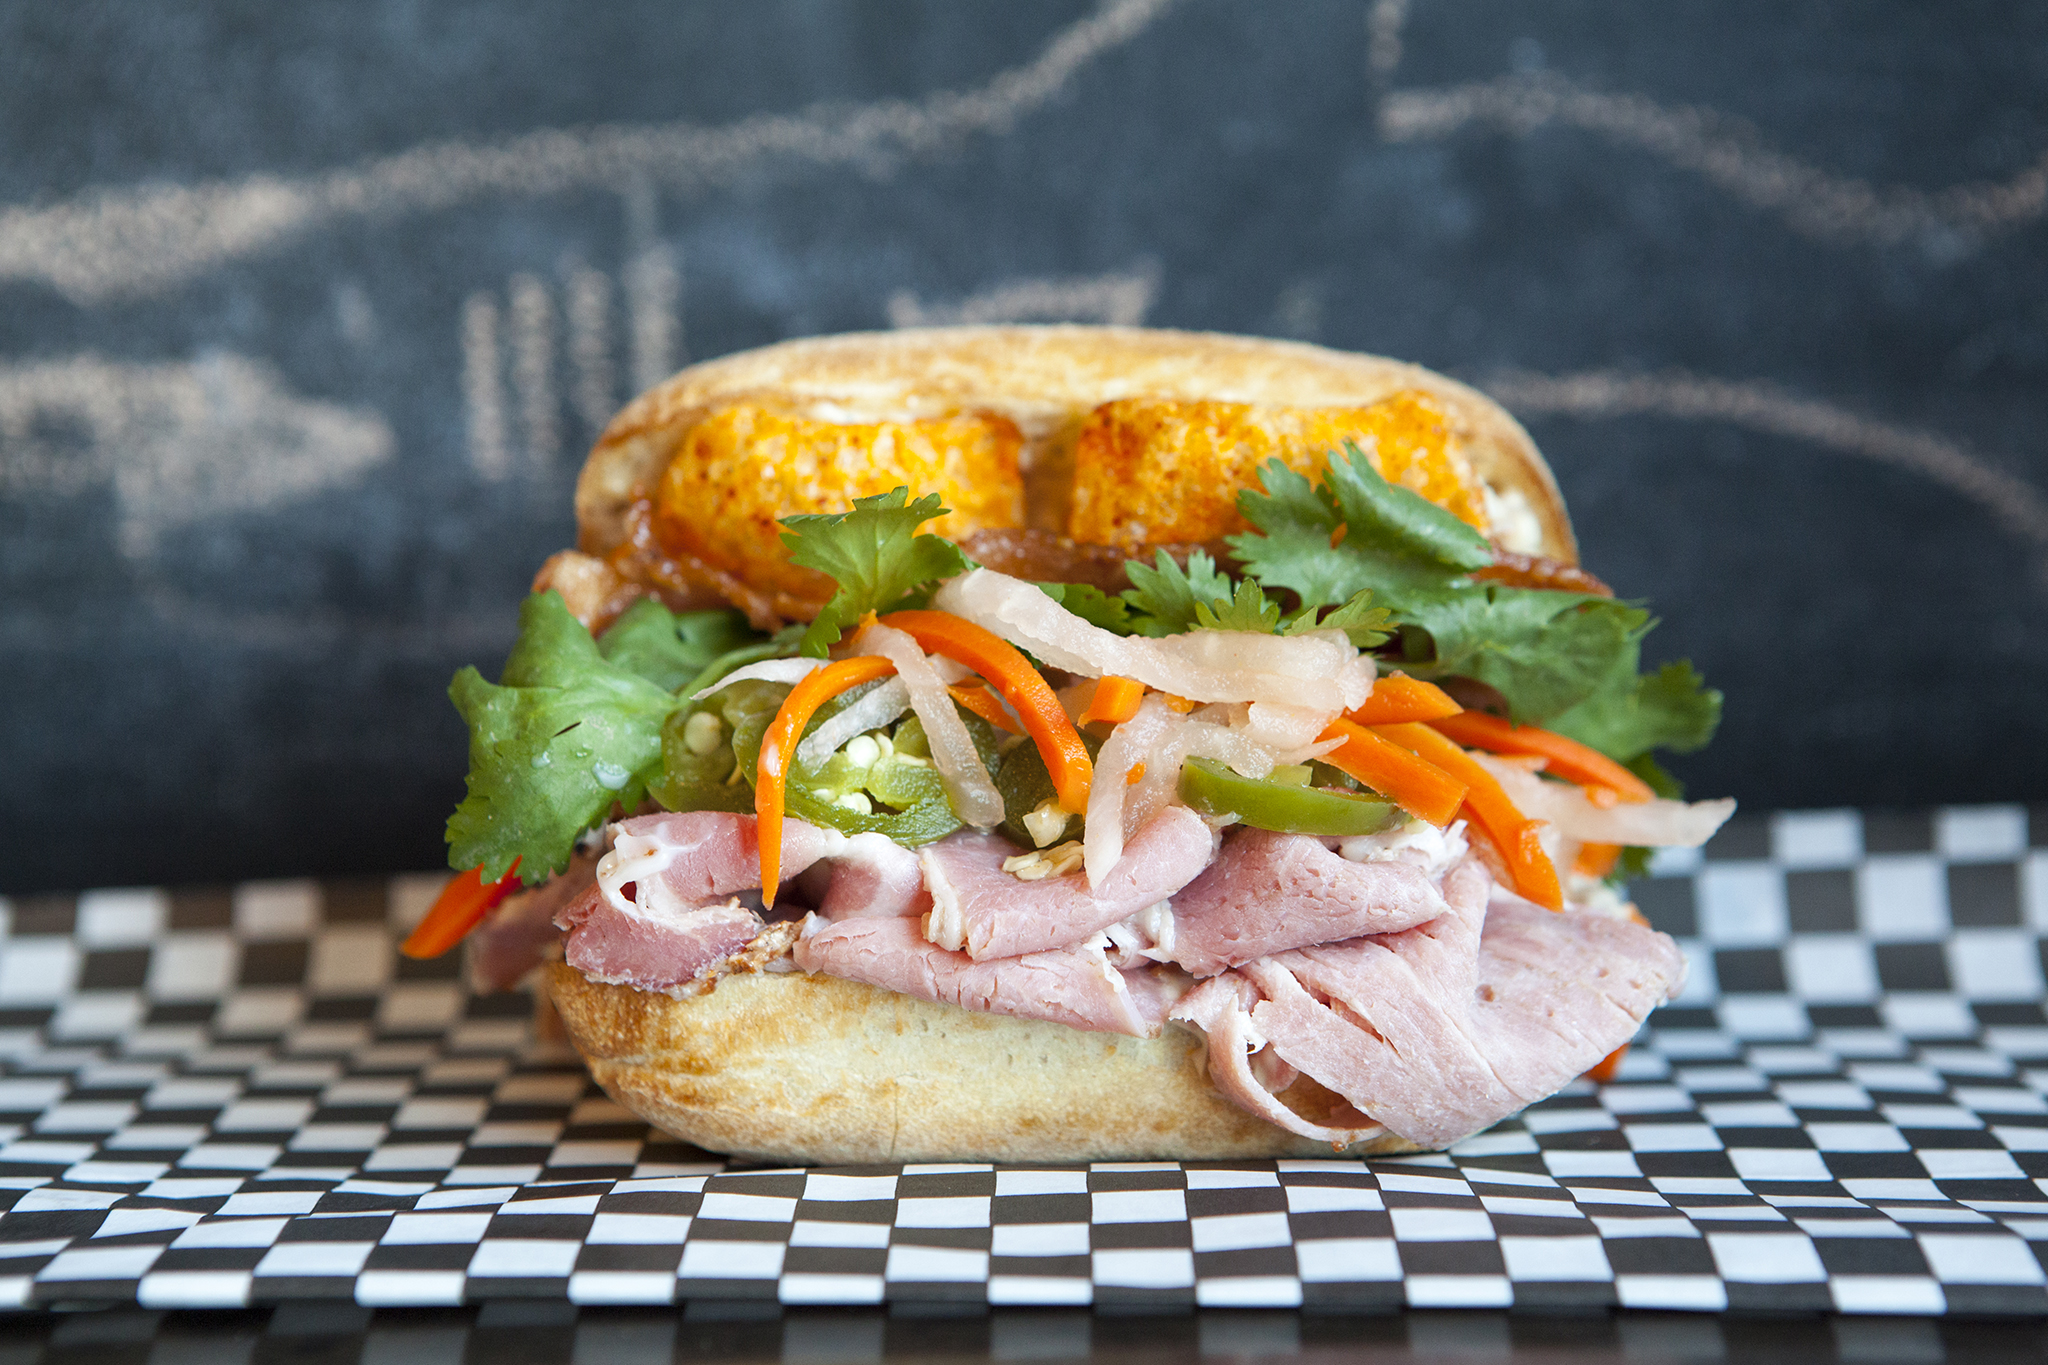 Sack Sandwiches